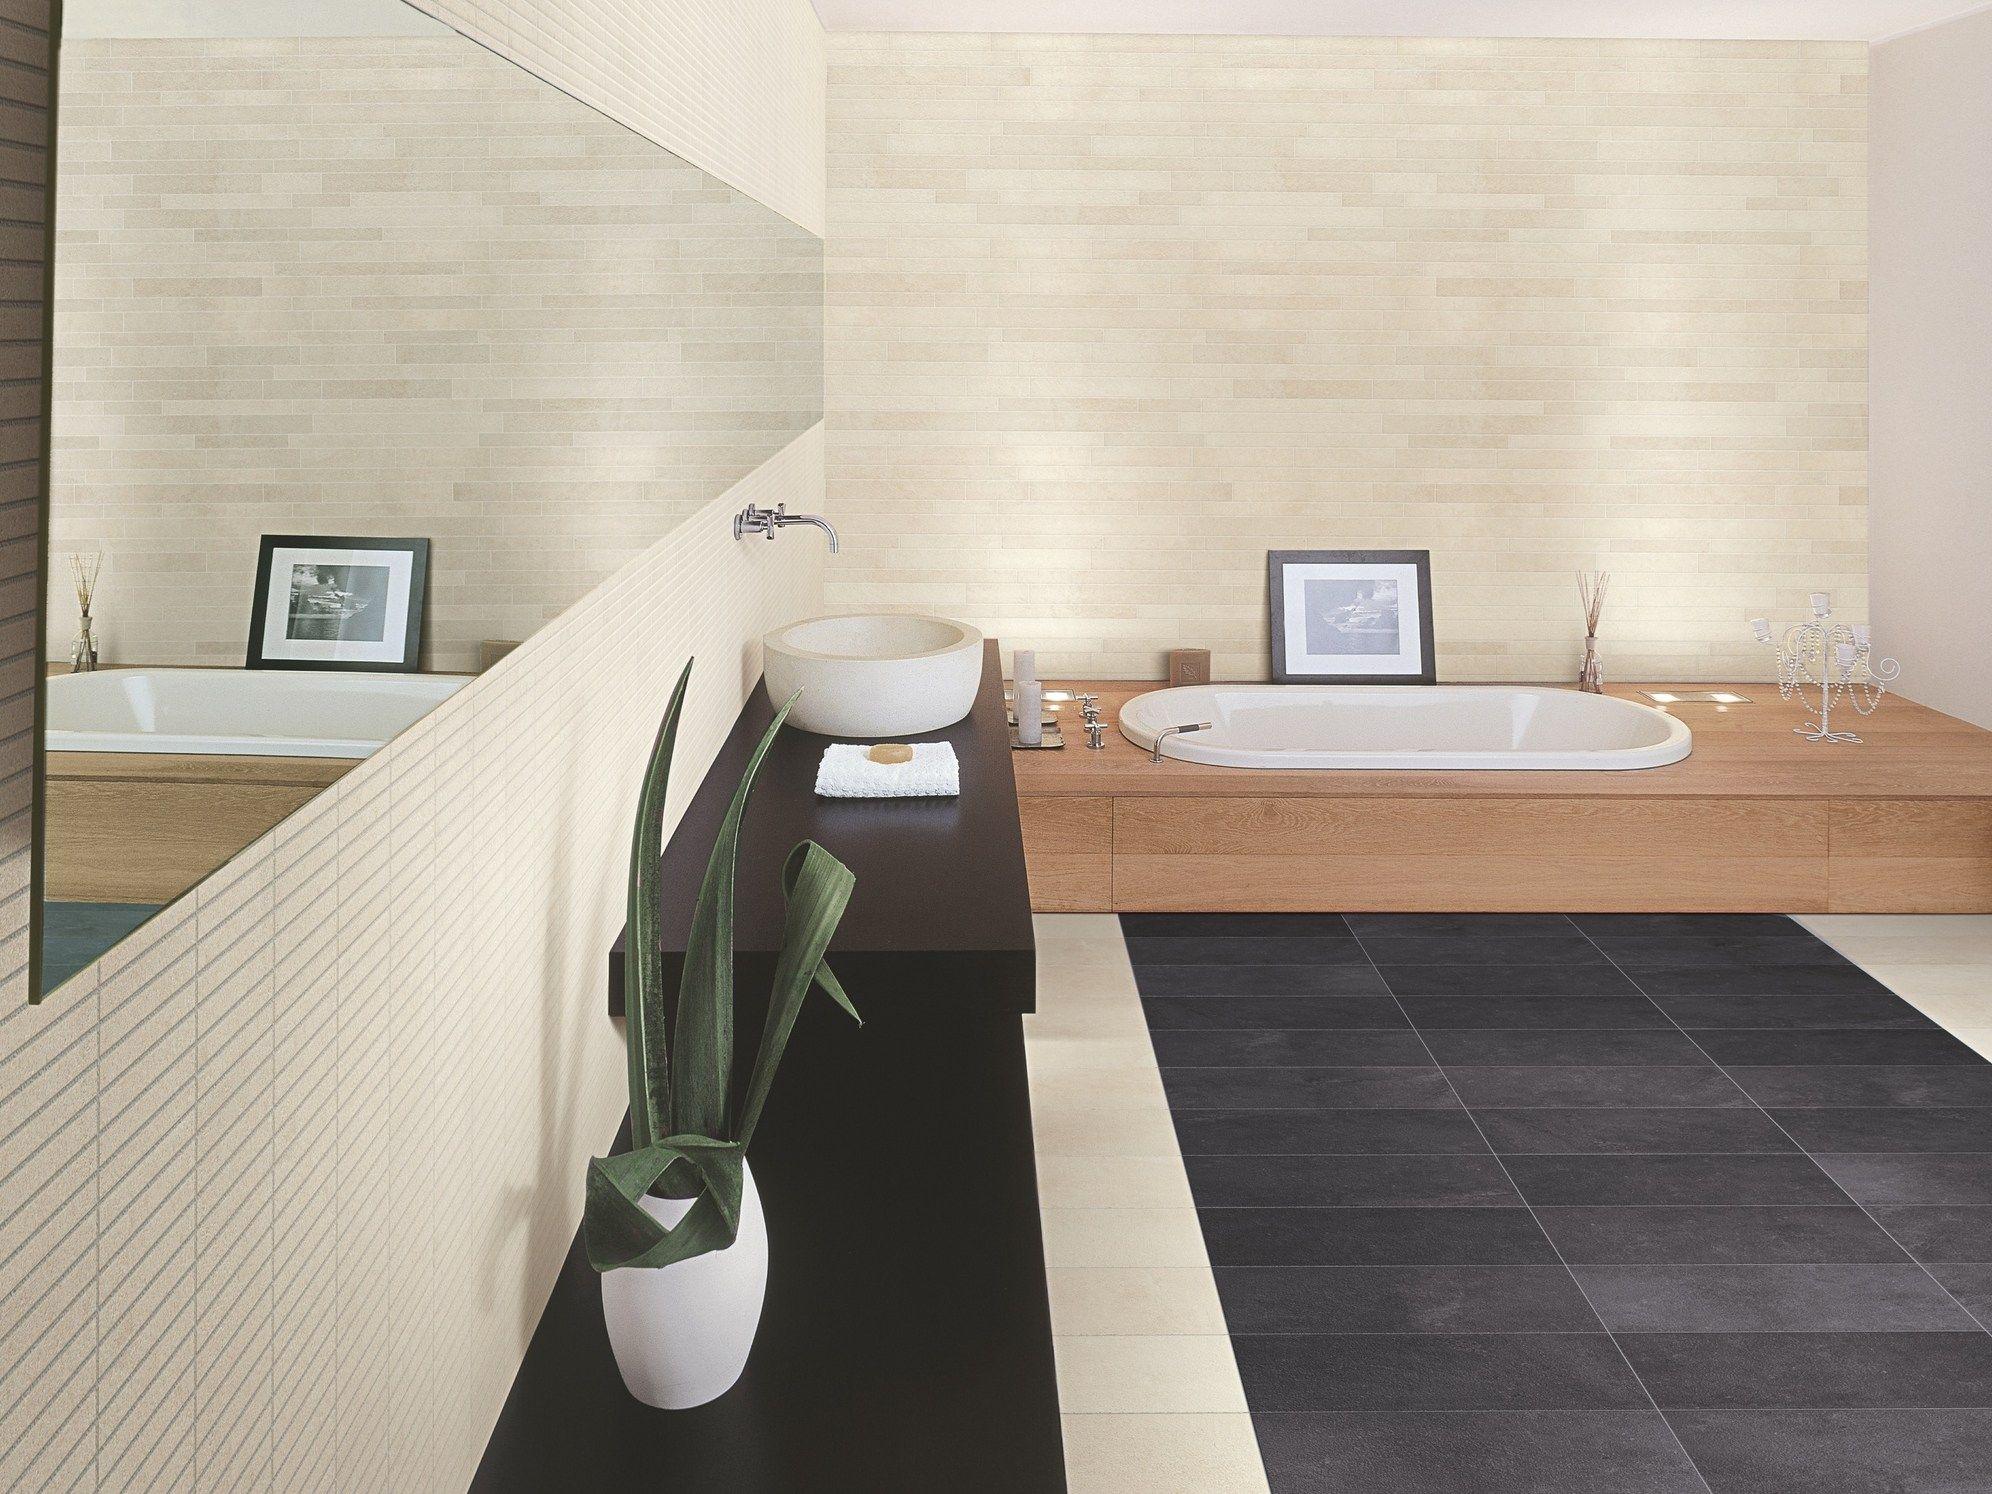 Pavimento rivestimento in gres porcellanato effetto pietra - Casalgrande padana gres porcellanato ...